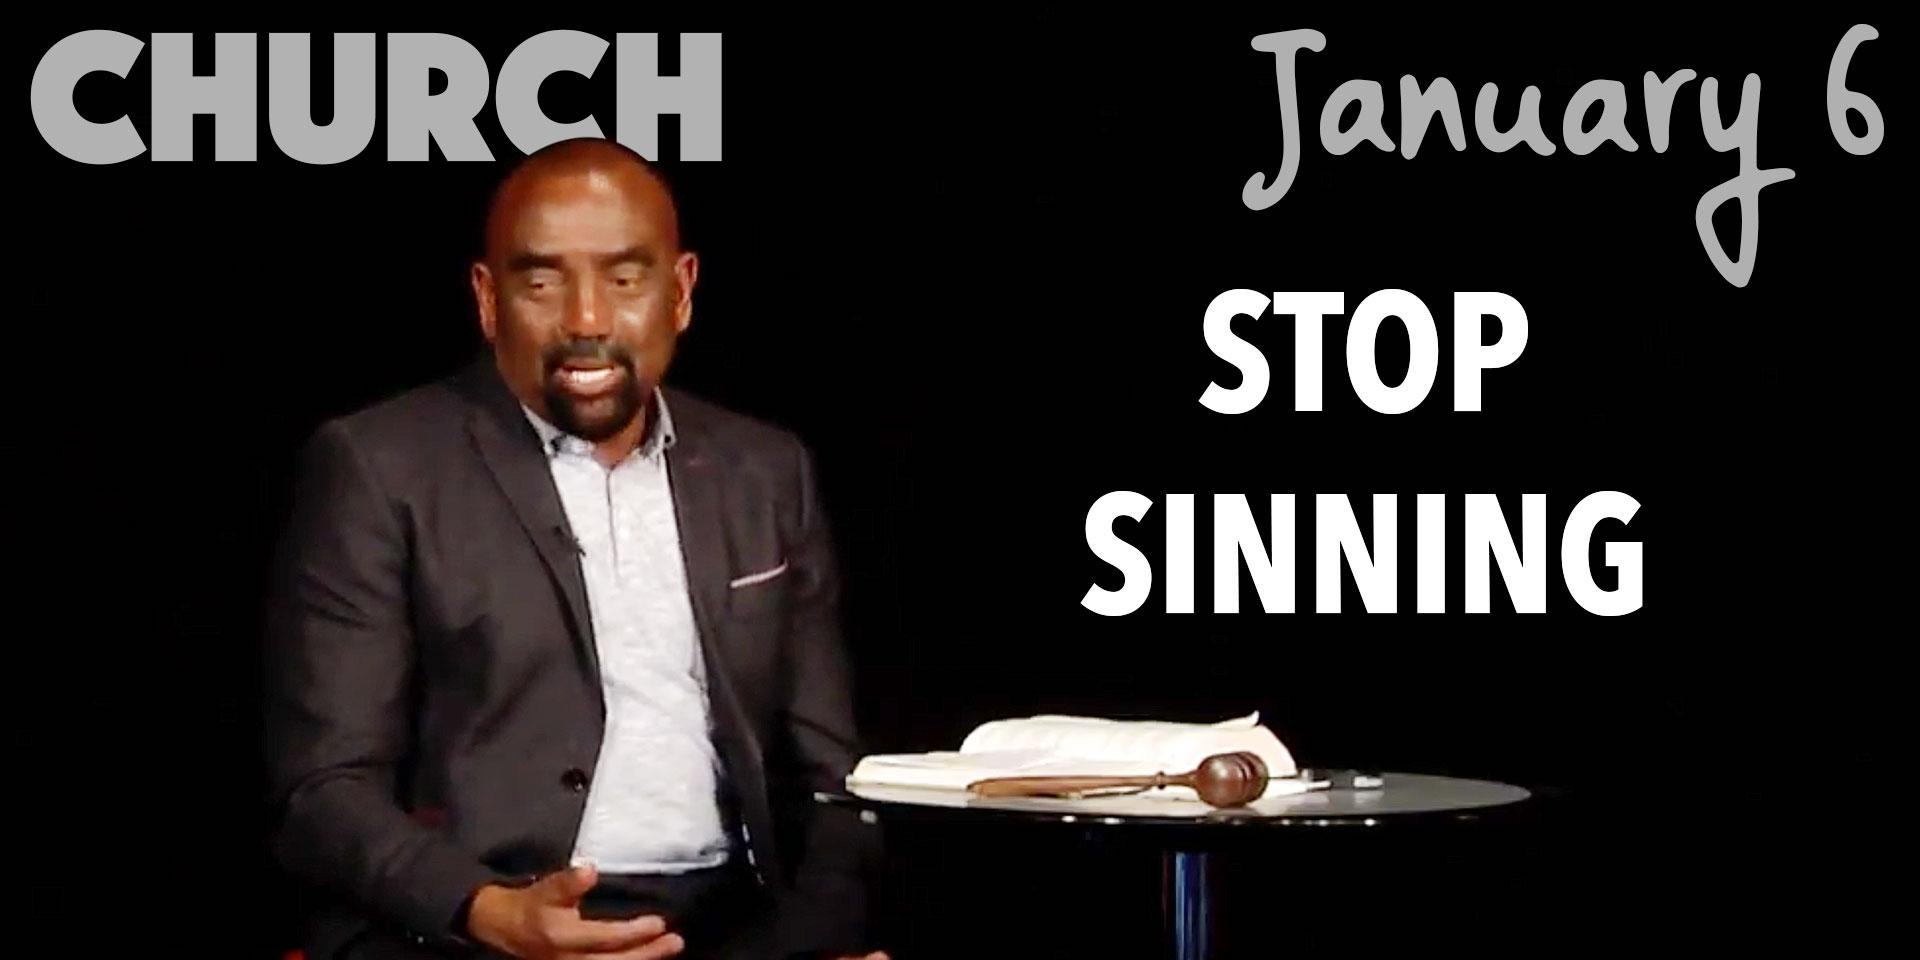 Church Jan 6: Stop Sinning